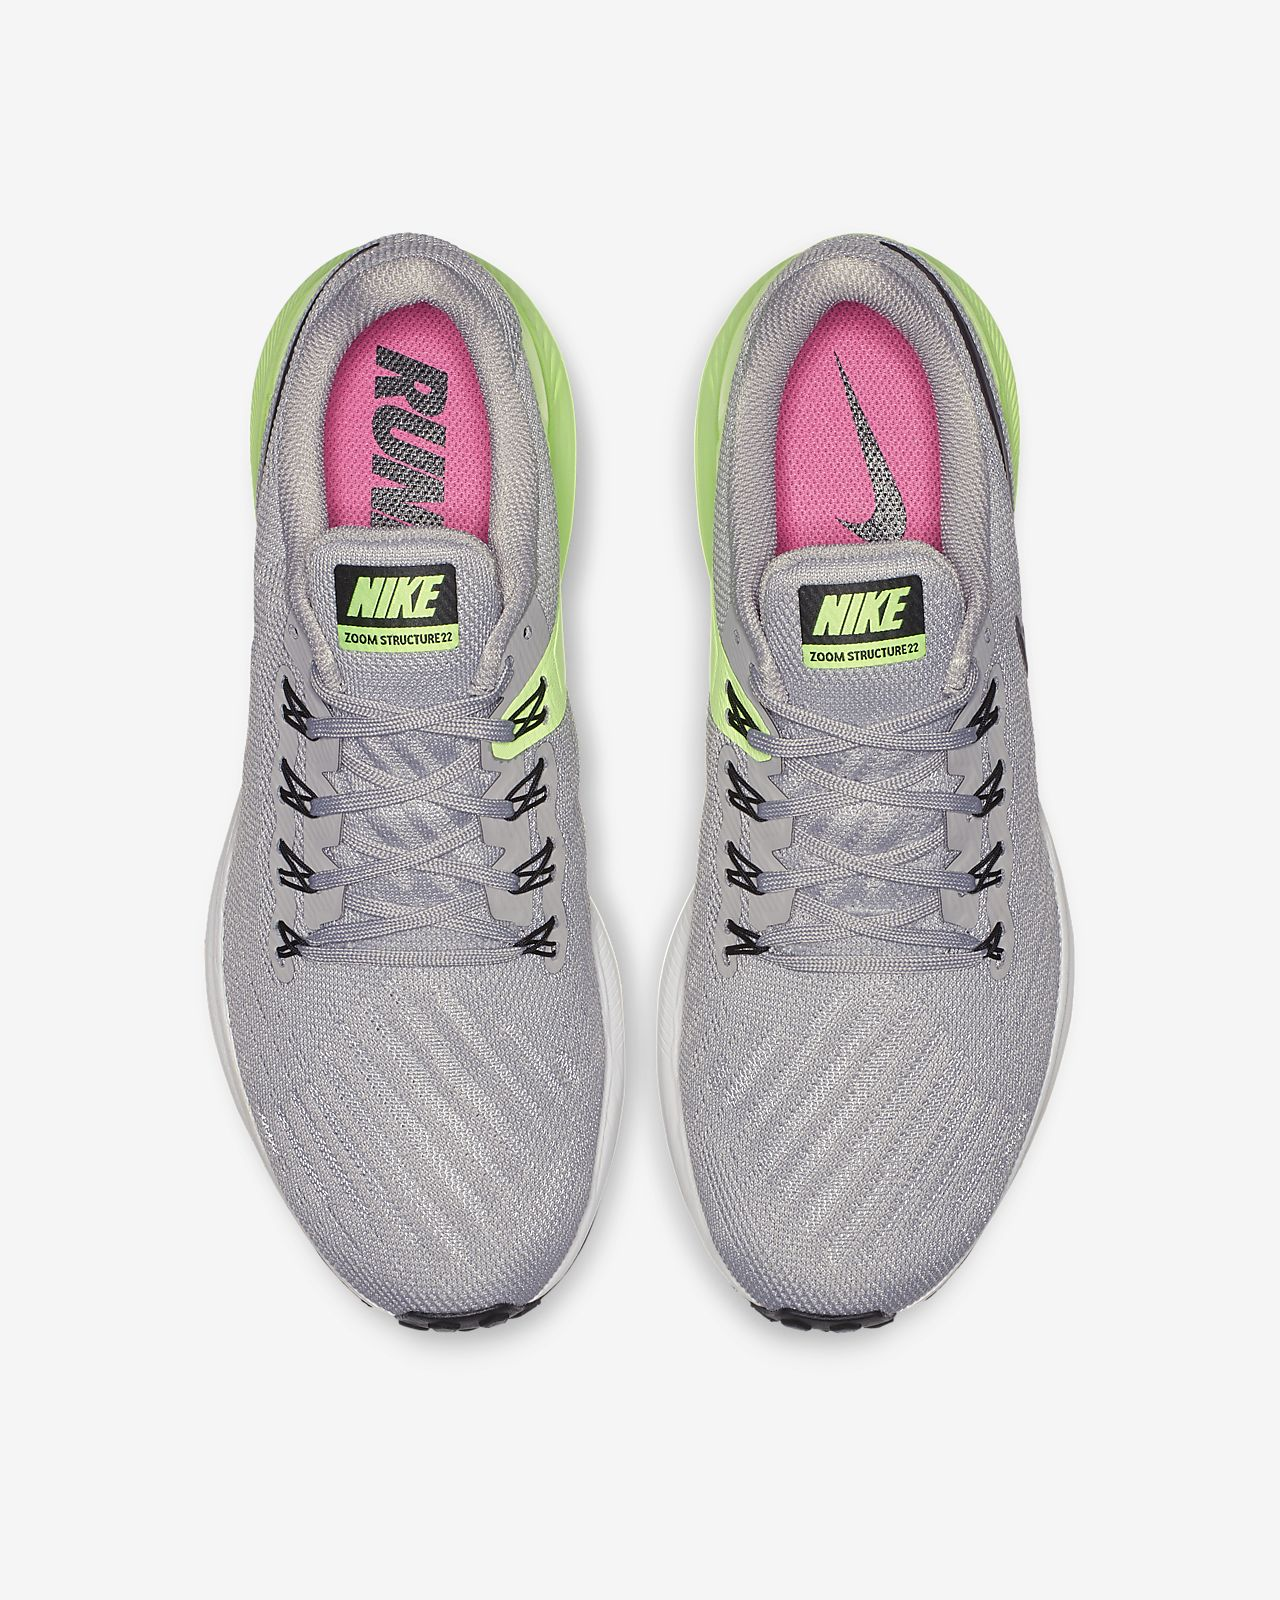 f4d02a99b6386 Nike Air Zoom Structure 22 Men s Running Shoe. Nike.com GB